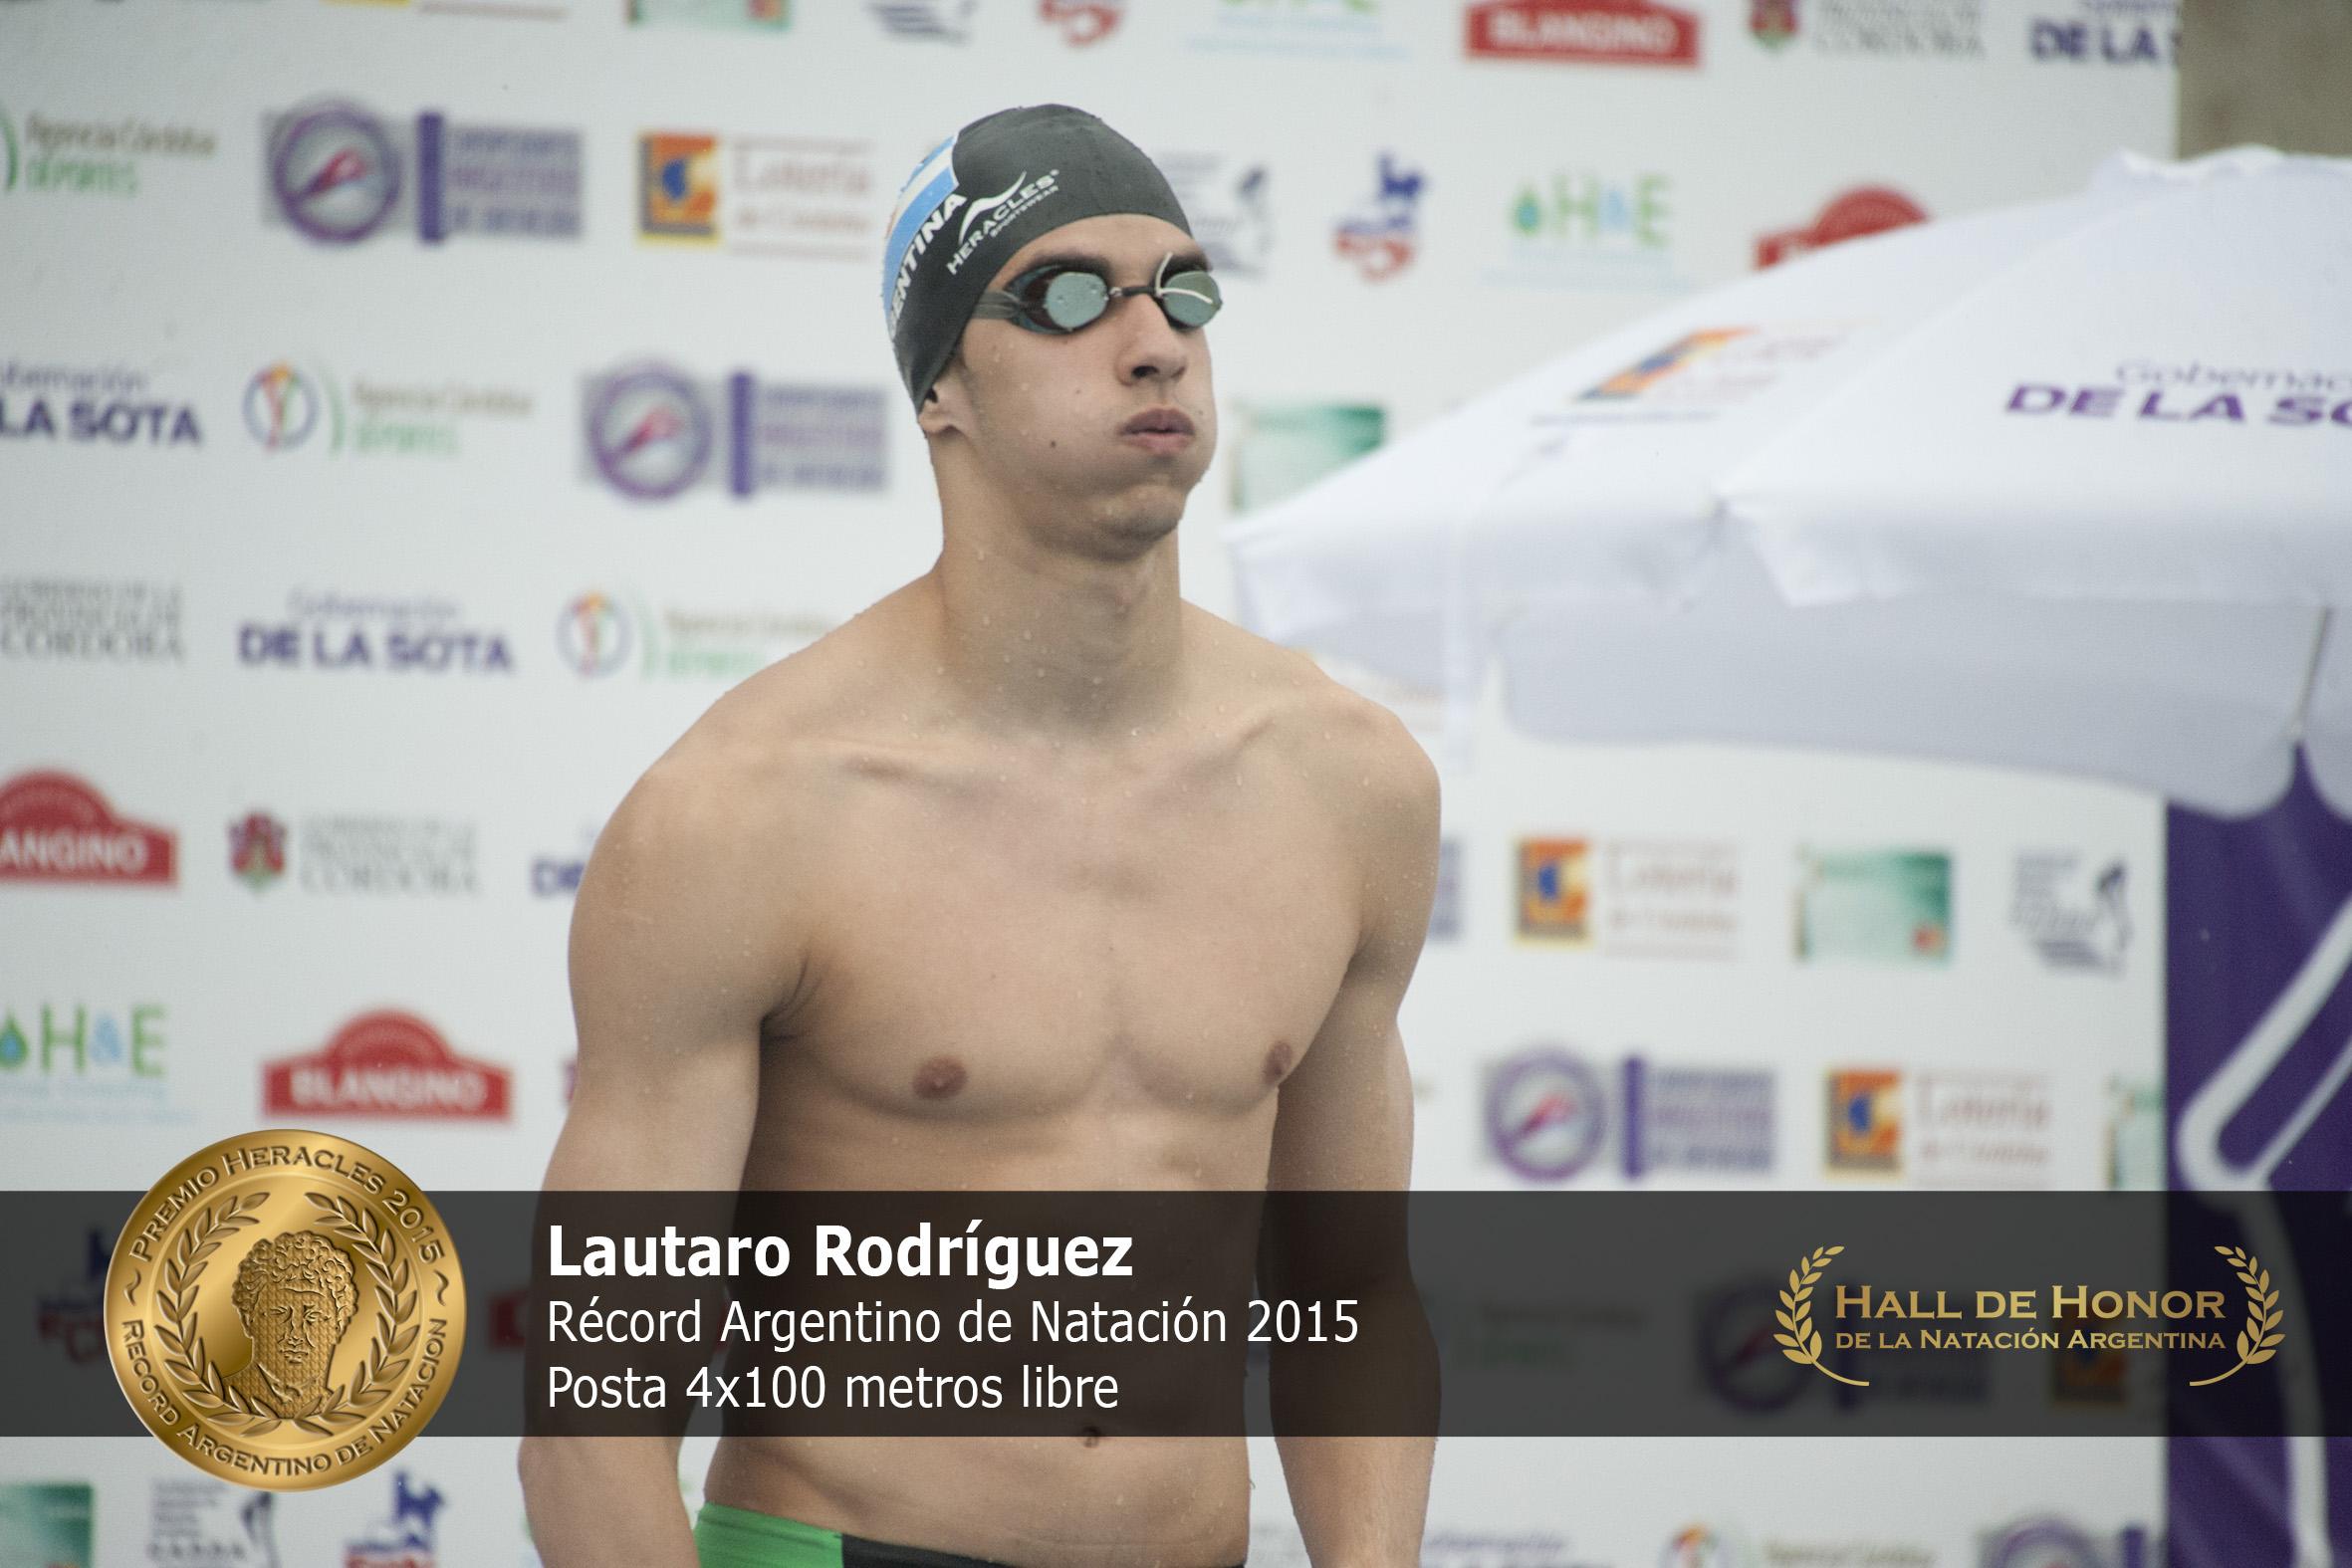 Lautaro Rodríguez